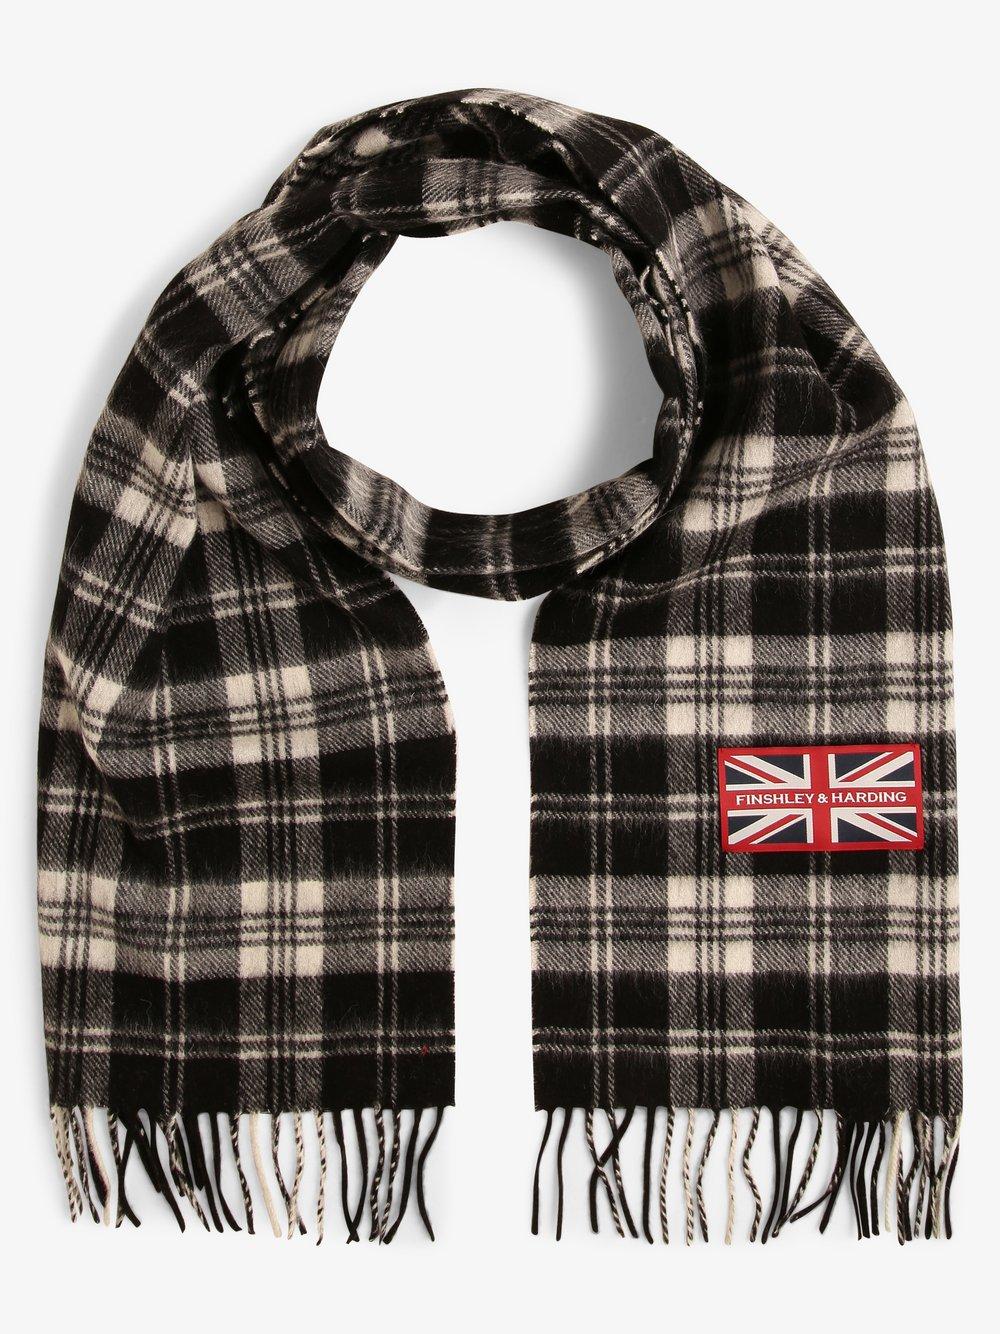 Finshley & Harding London – Szalik męski, czarny Van Graaf 449539-0001-00000